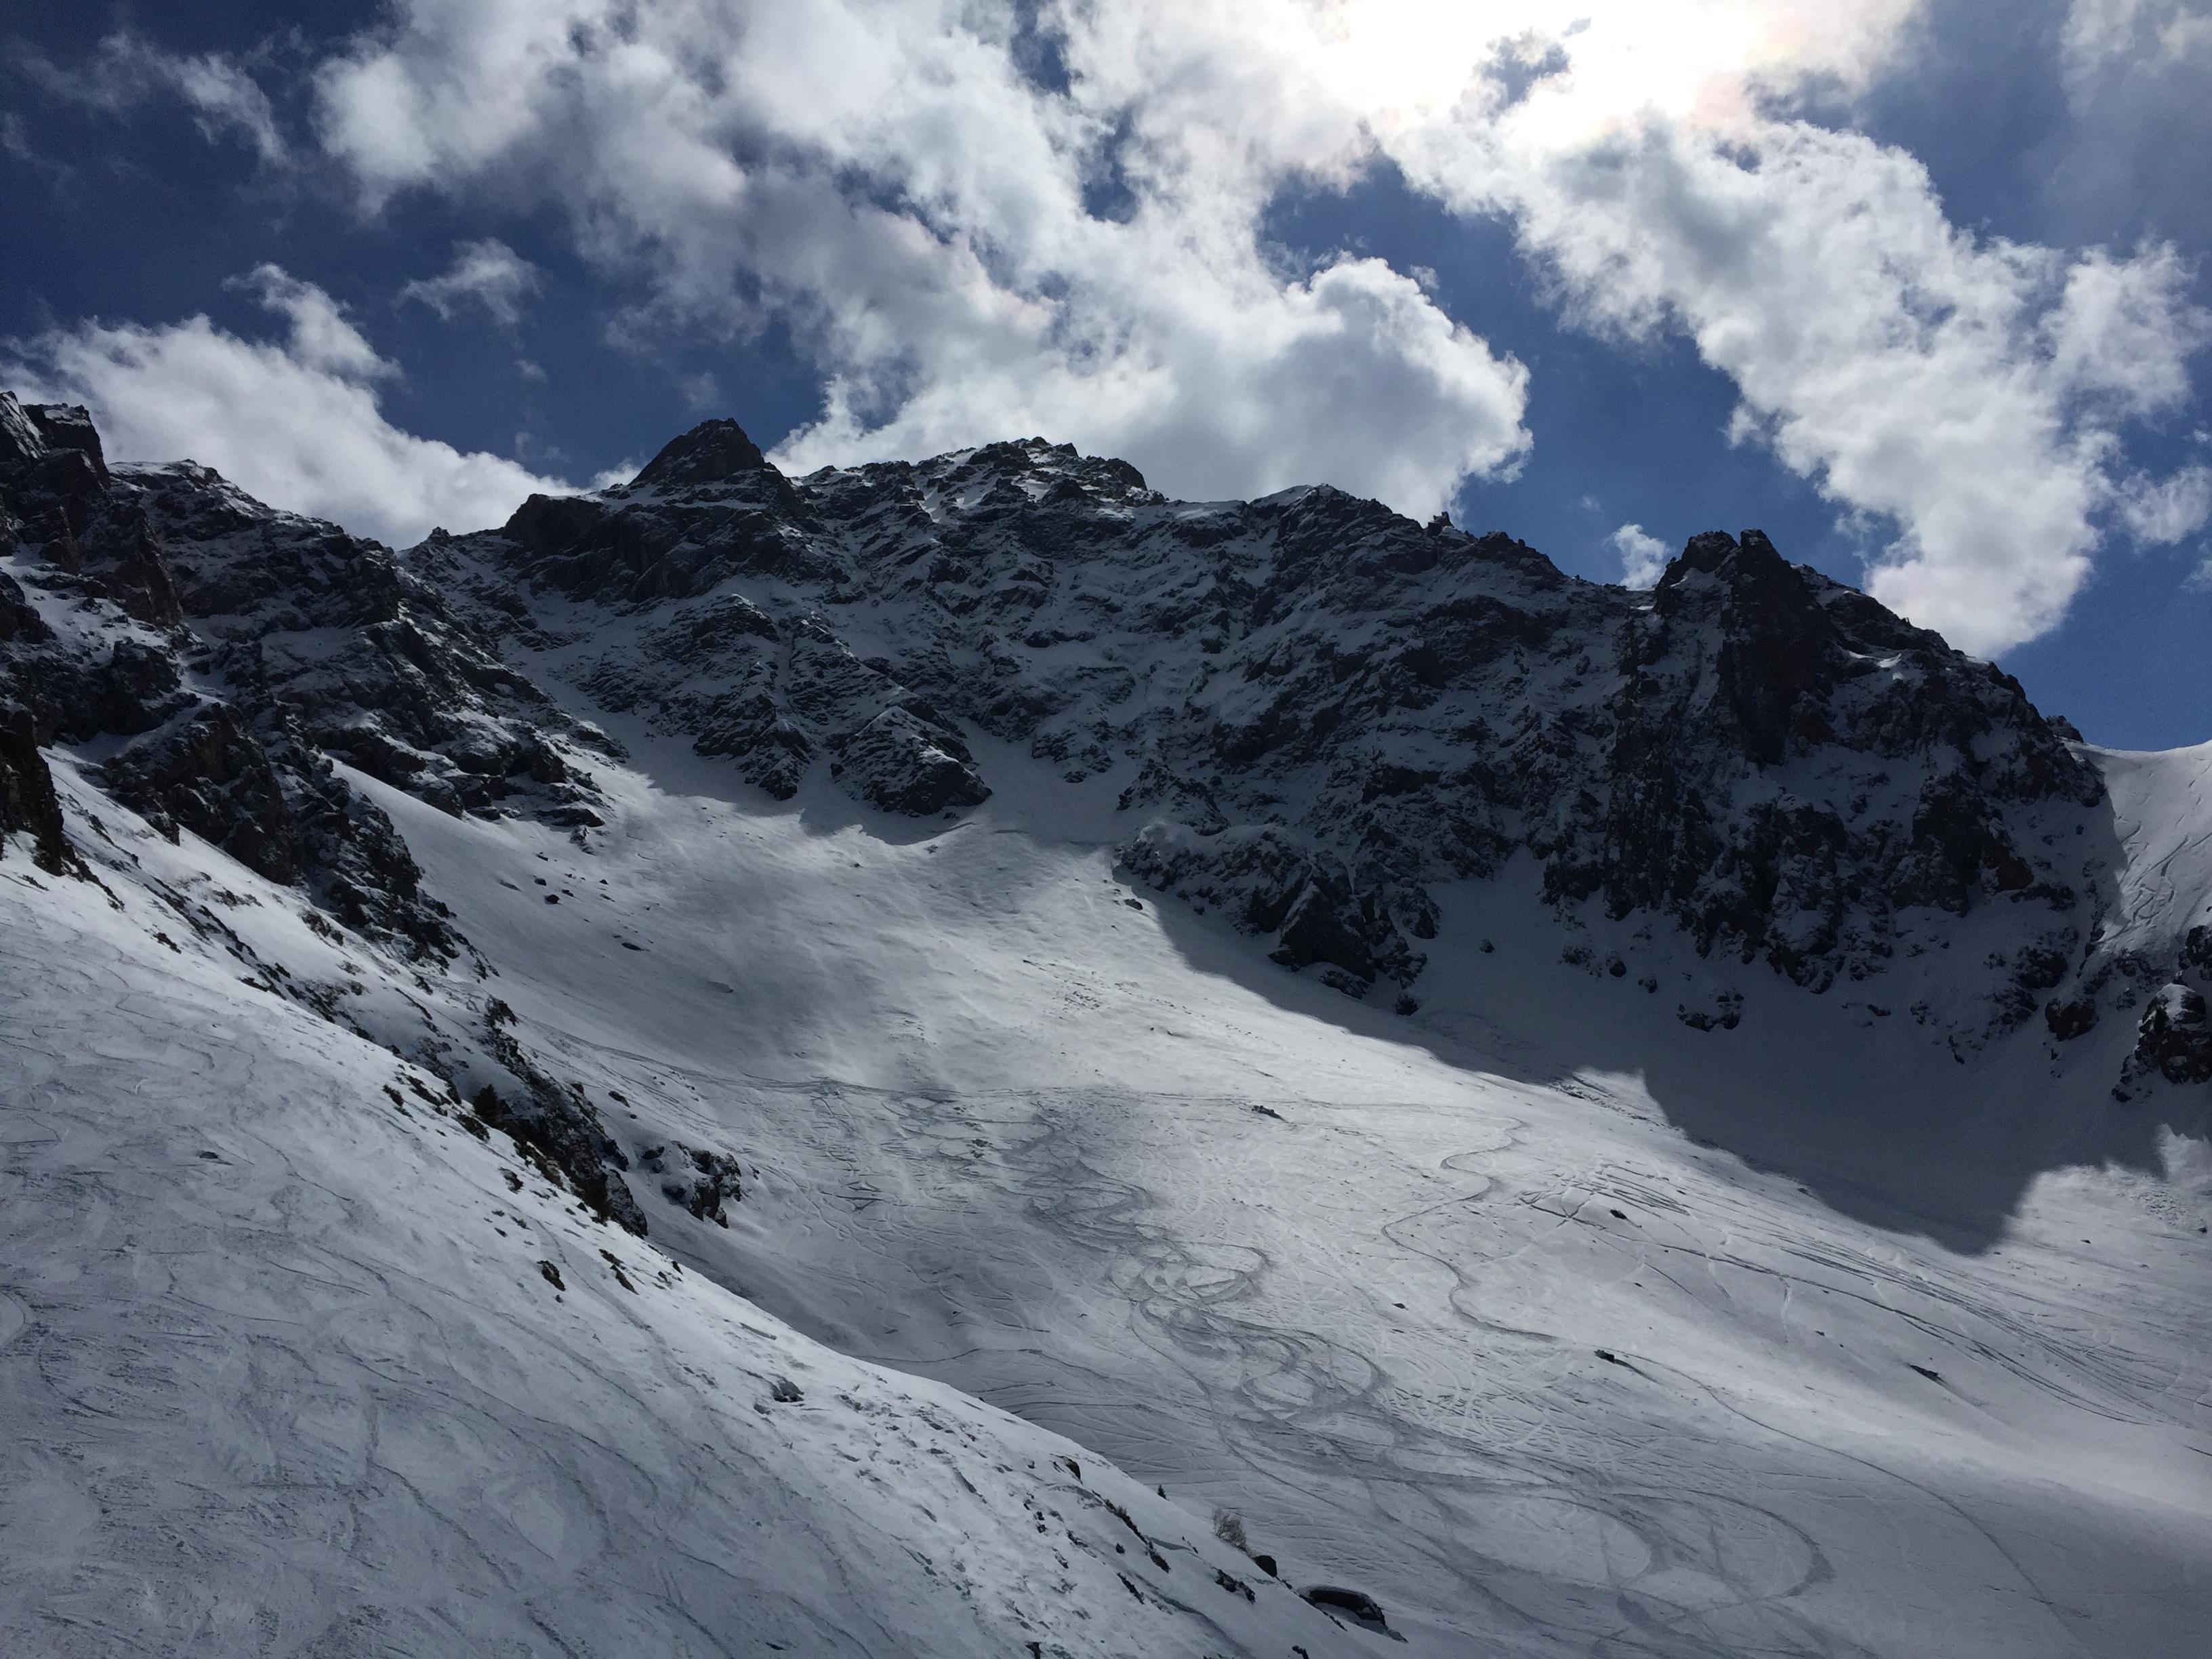 March skiing, Shymbulak